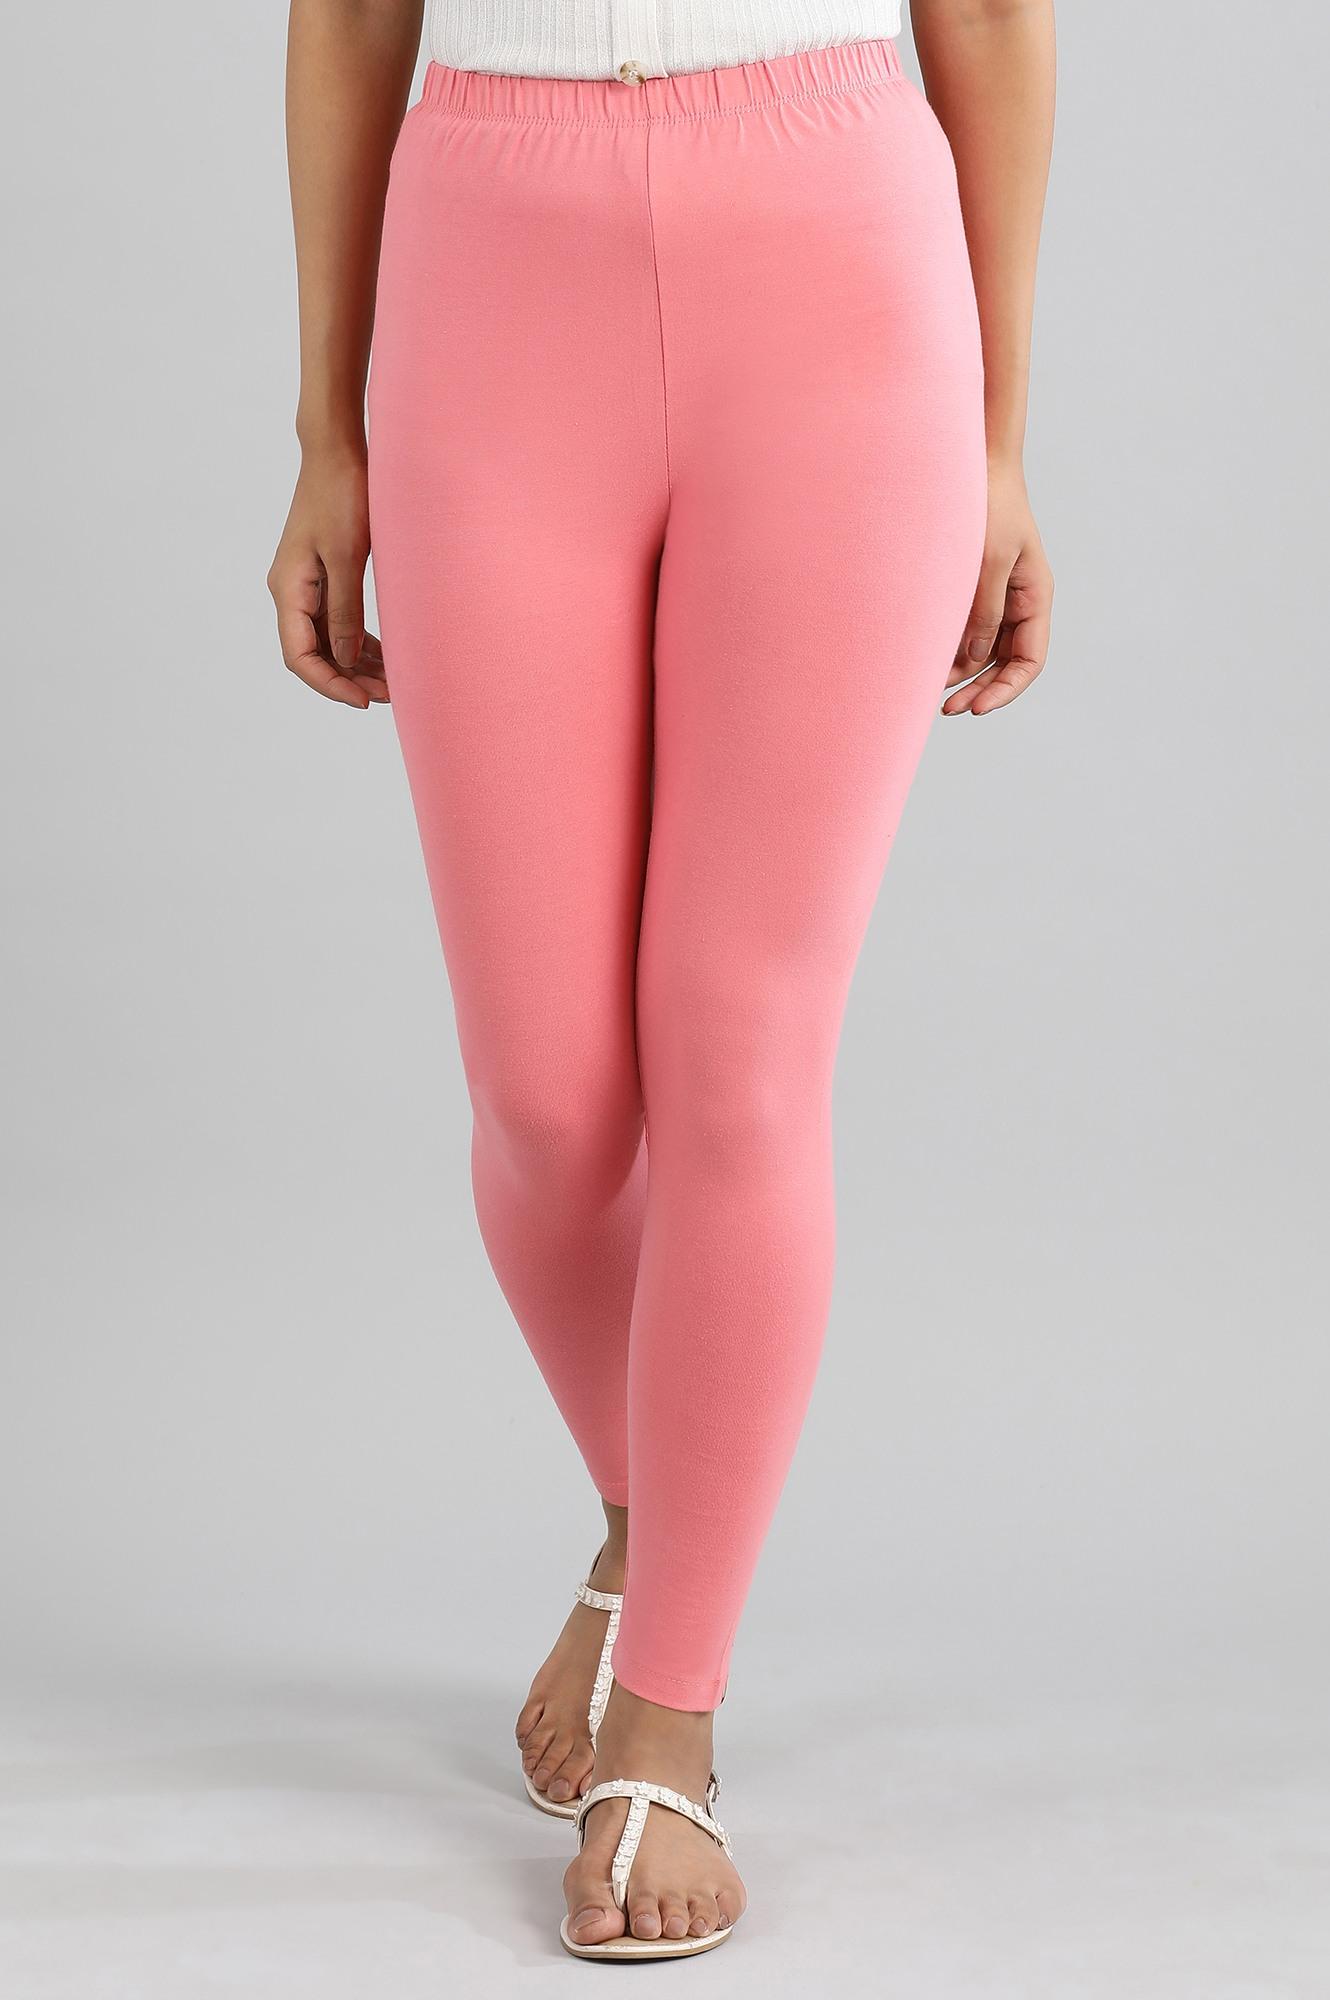 Aurelia | Pink Knitted Tights